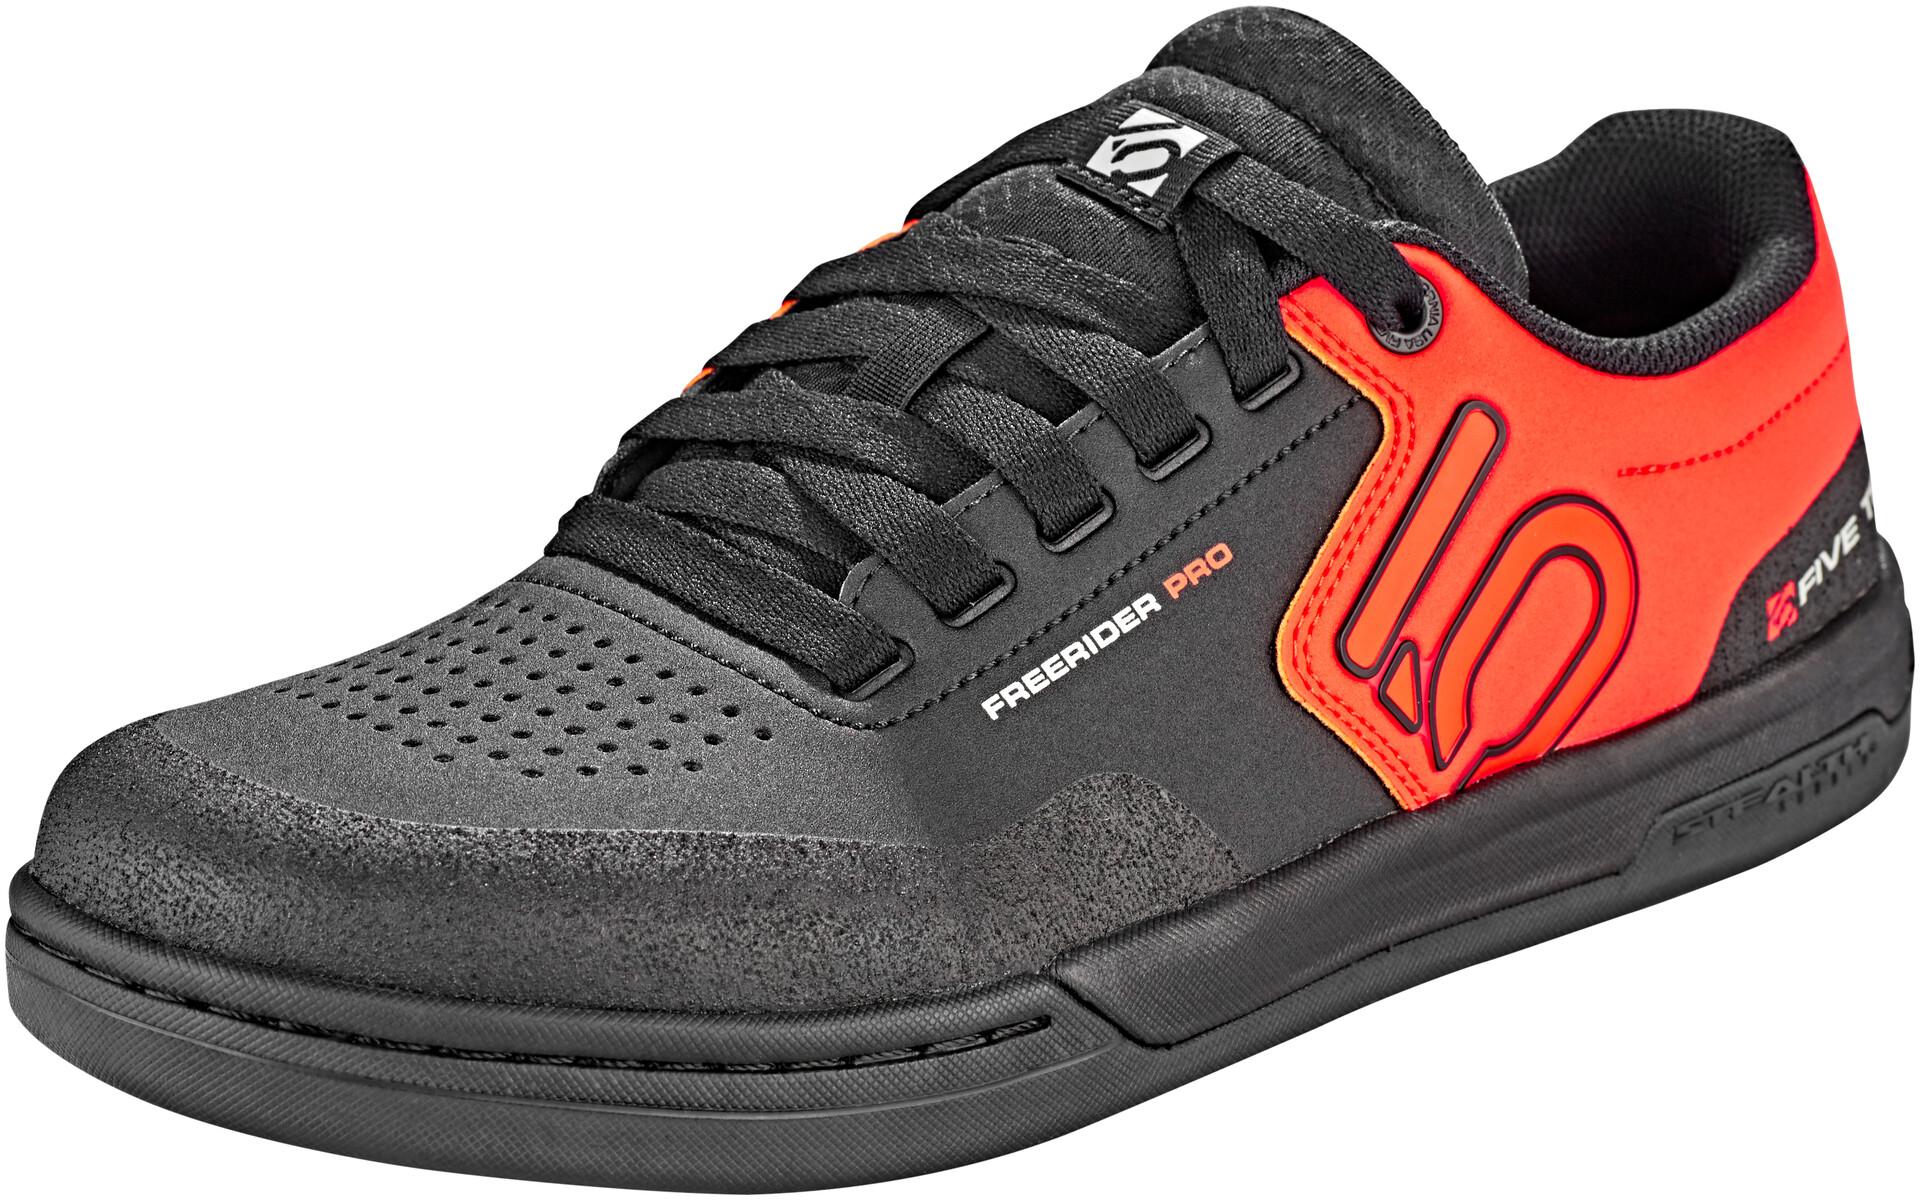 Herren Core Five Freerider Adidas Ten Pro Orangegretwo Blackactive Shoes WEH2DYeI9